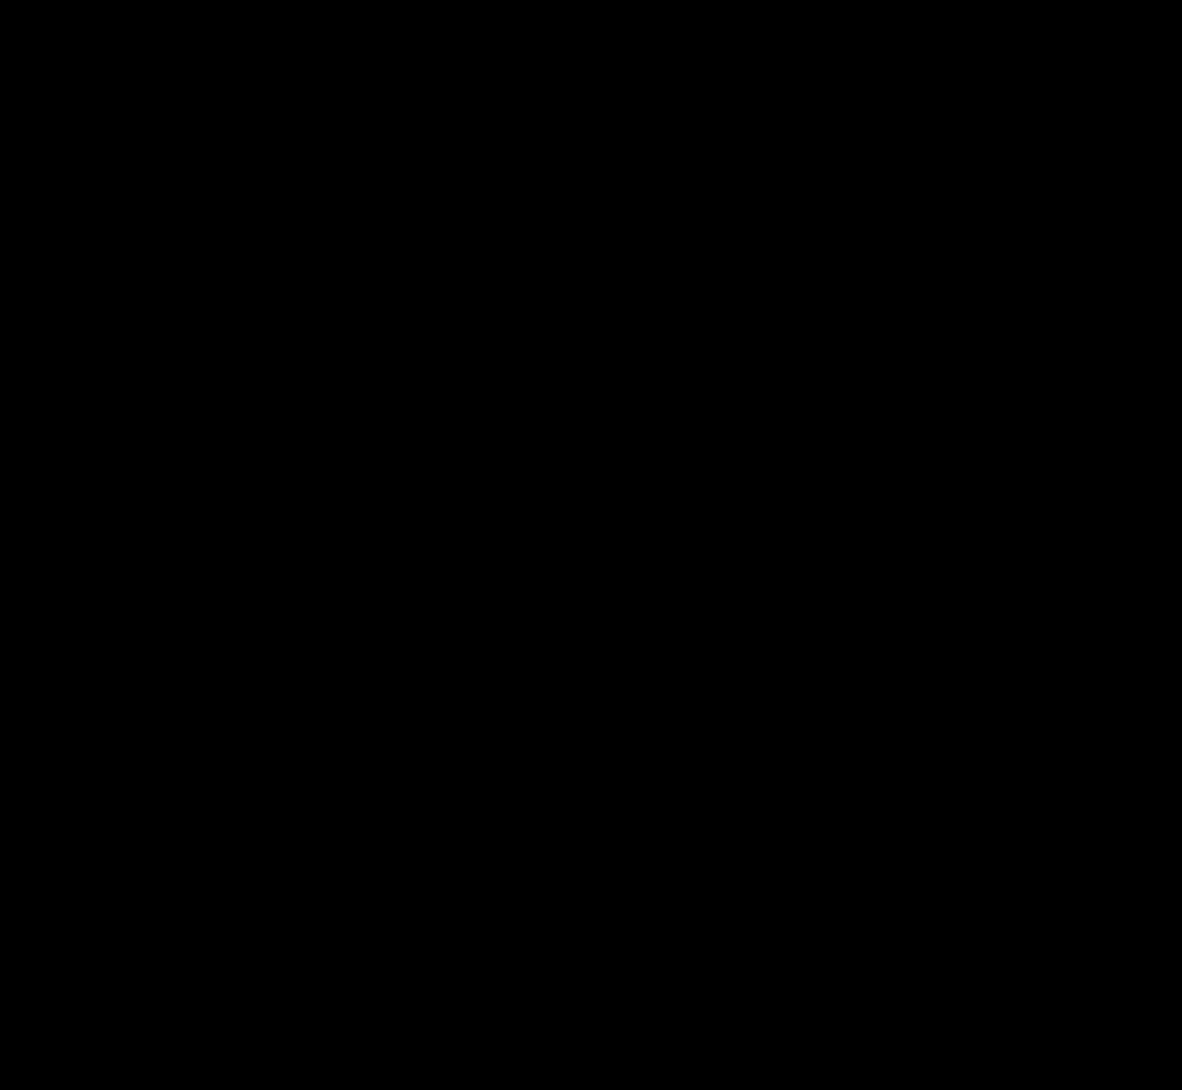 2-Phenoxypyridine-5-boronic acid pinacol ester